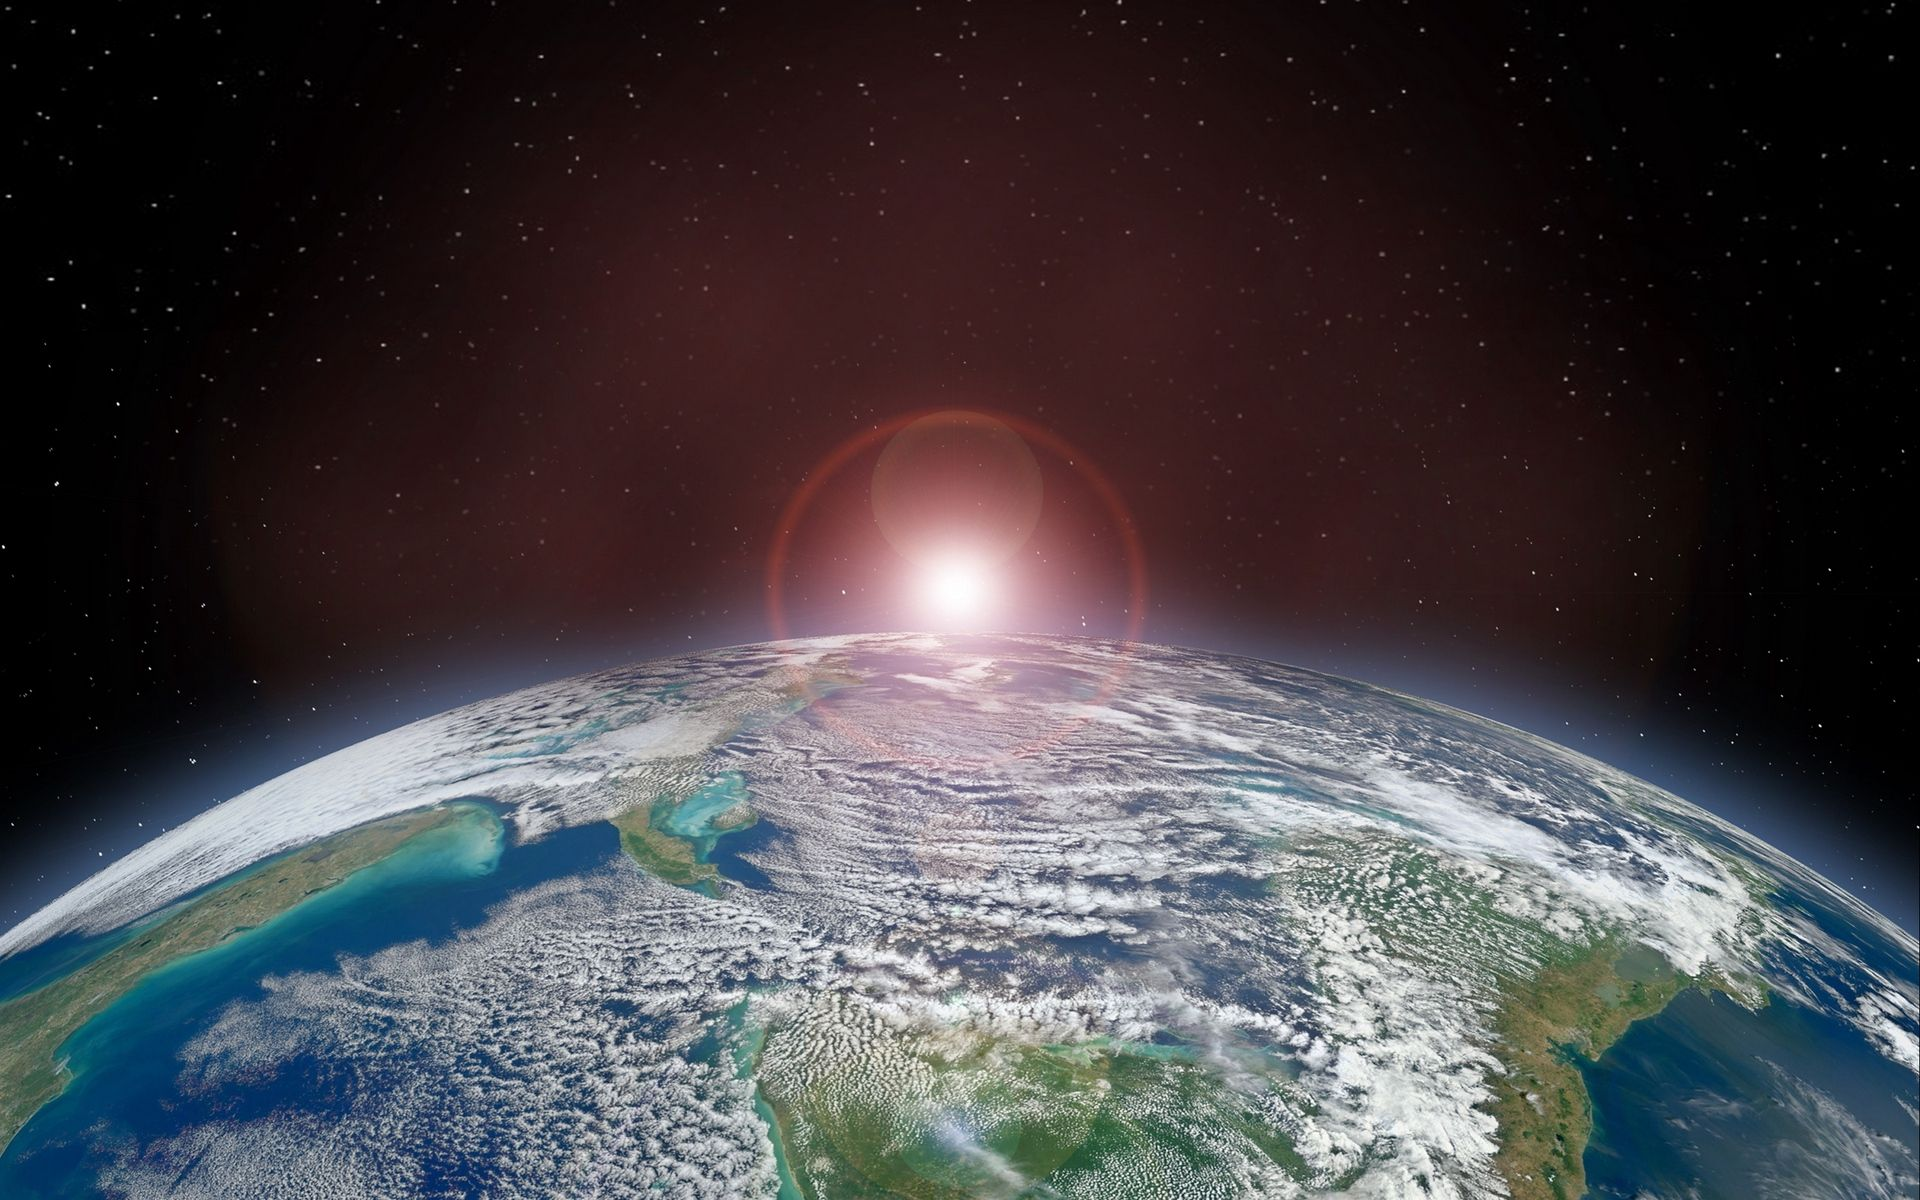 Earth Surface Hd Wallpaper Wallpaper Hd Wallpaper Earth Surface